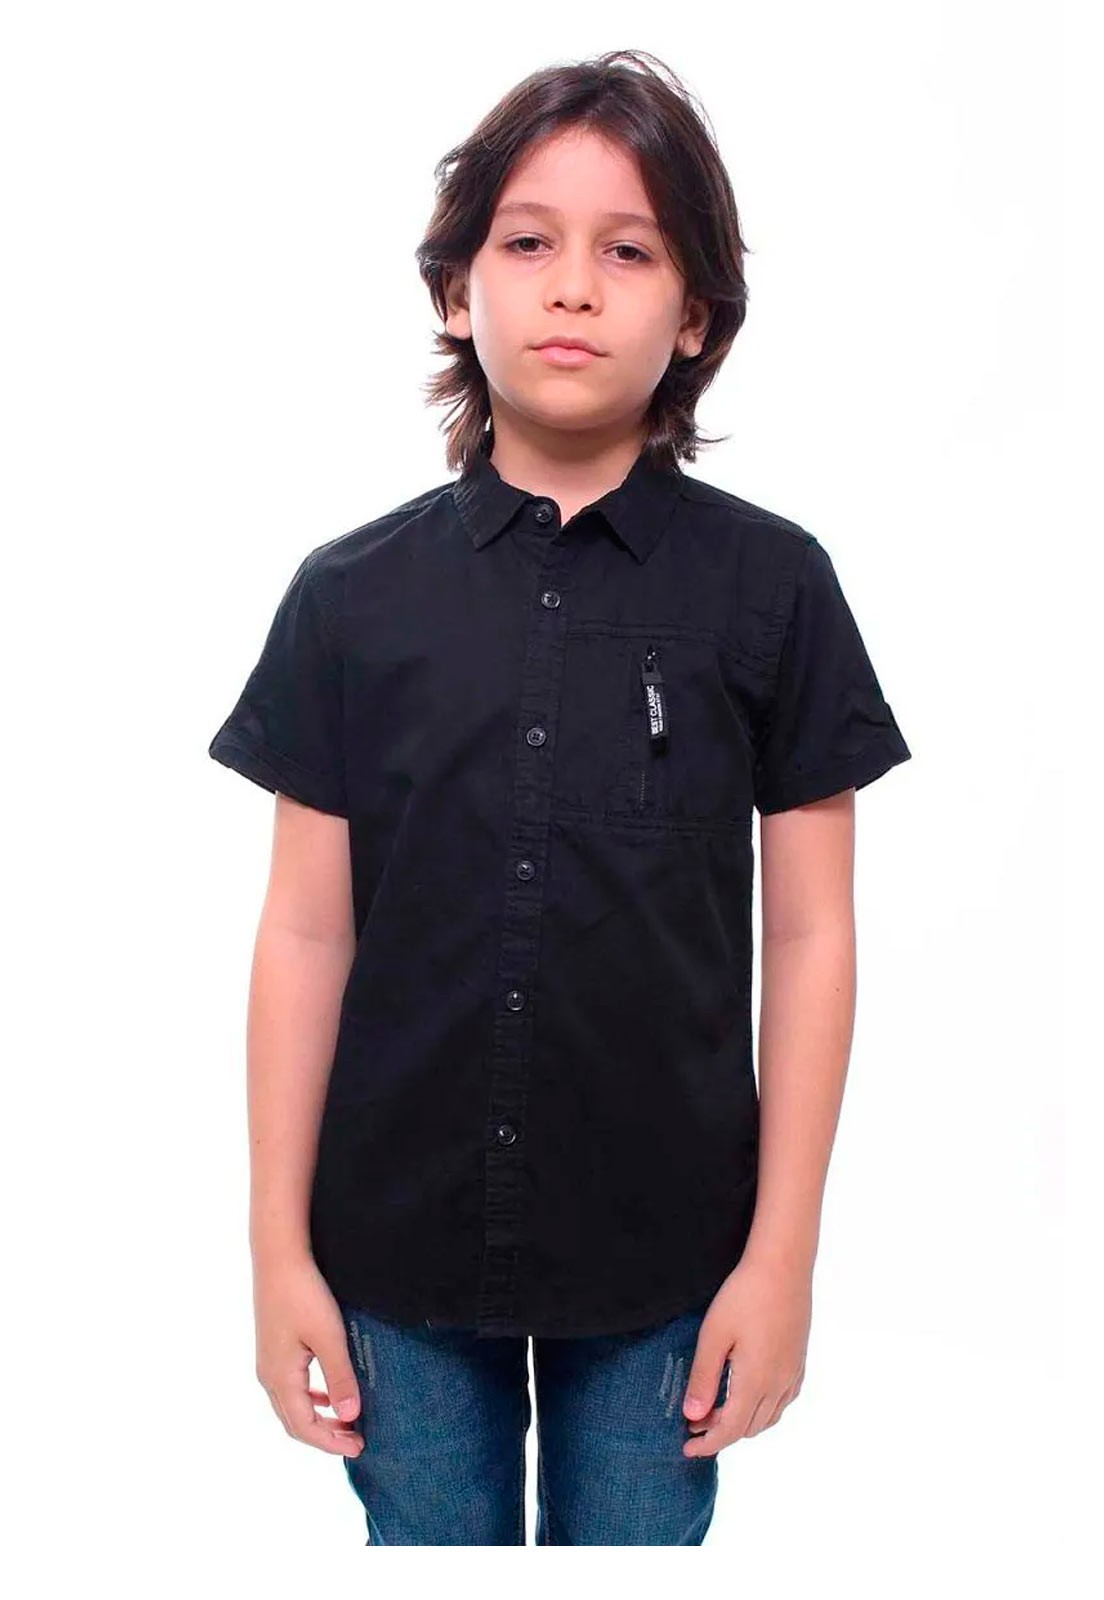 Camisa Juvenil Masculina Manga Curta Crocker - 47224  - CROCKER JEANS